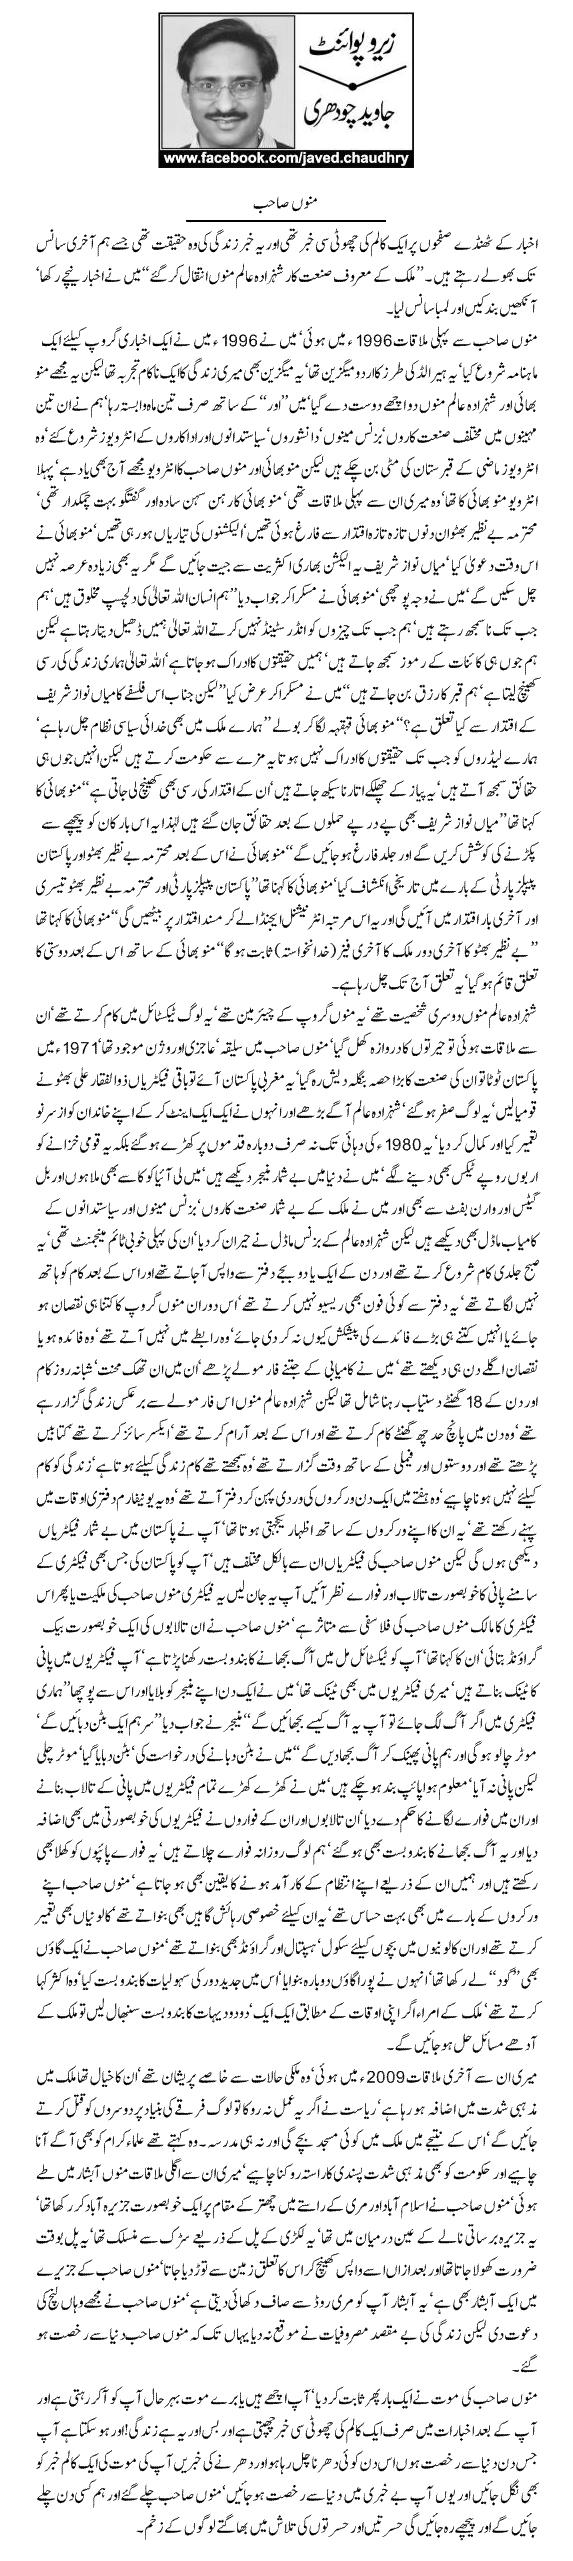 Munu Sahb by Javed Chaudhry 21-11-14